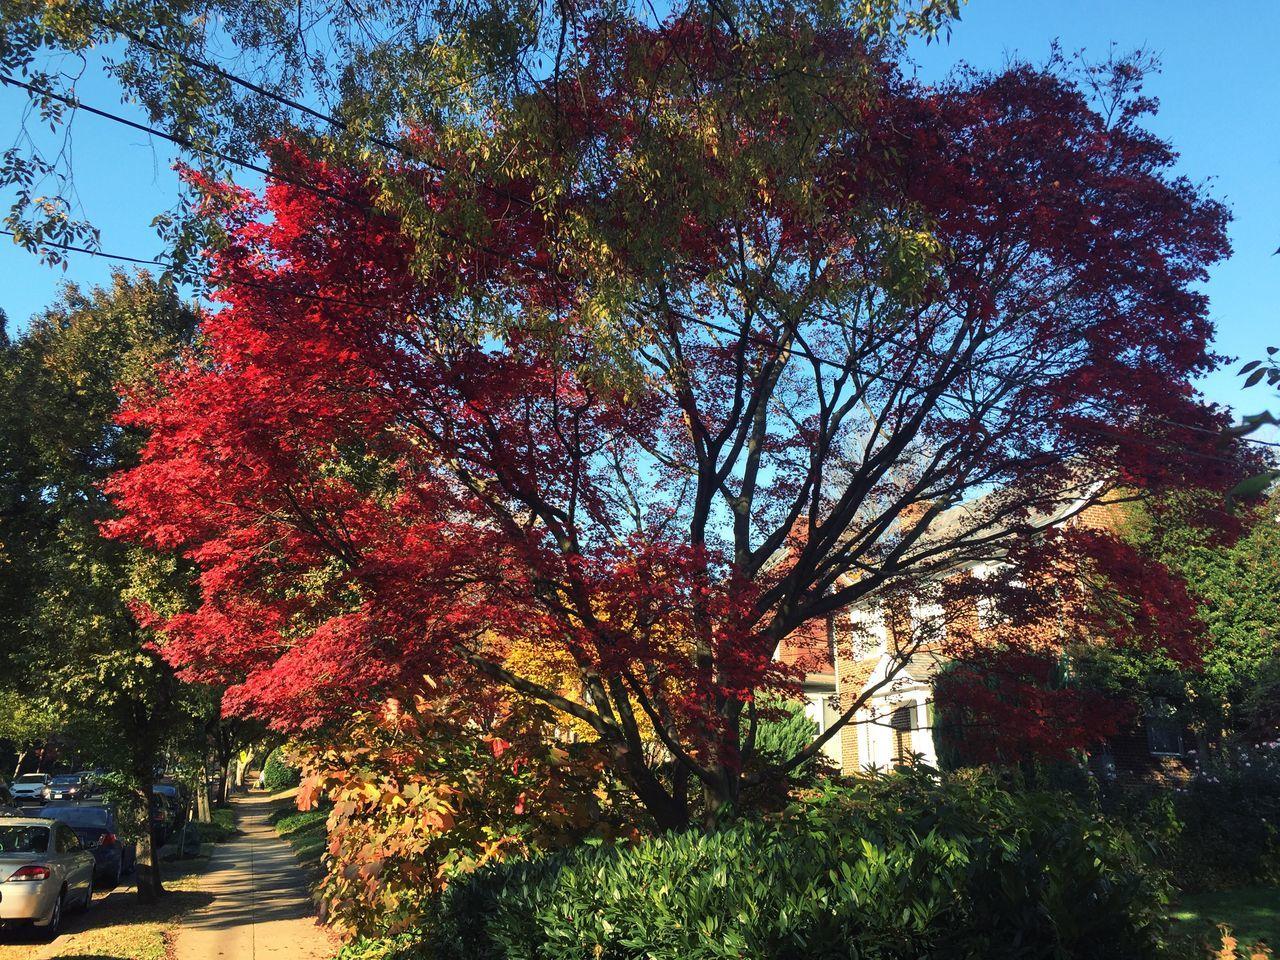 Washington, D. C. Tree Beauty In Nature Autumn Eyeemphotography EyeEm Best Shots Colors Of Autumn Eyeemcollection Showcasedecember